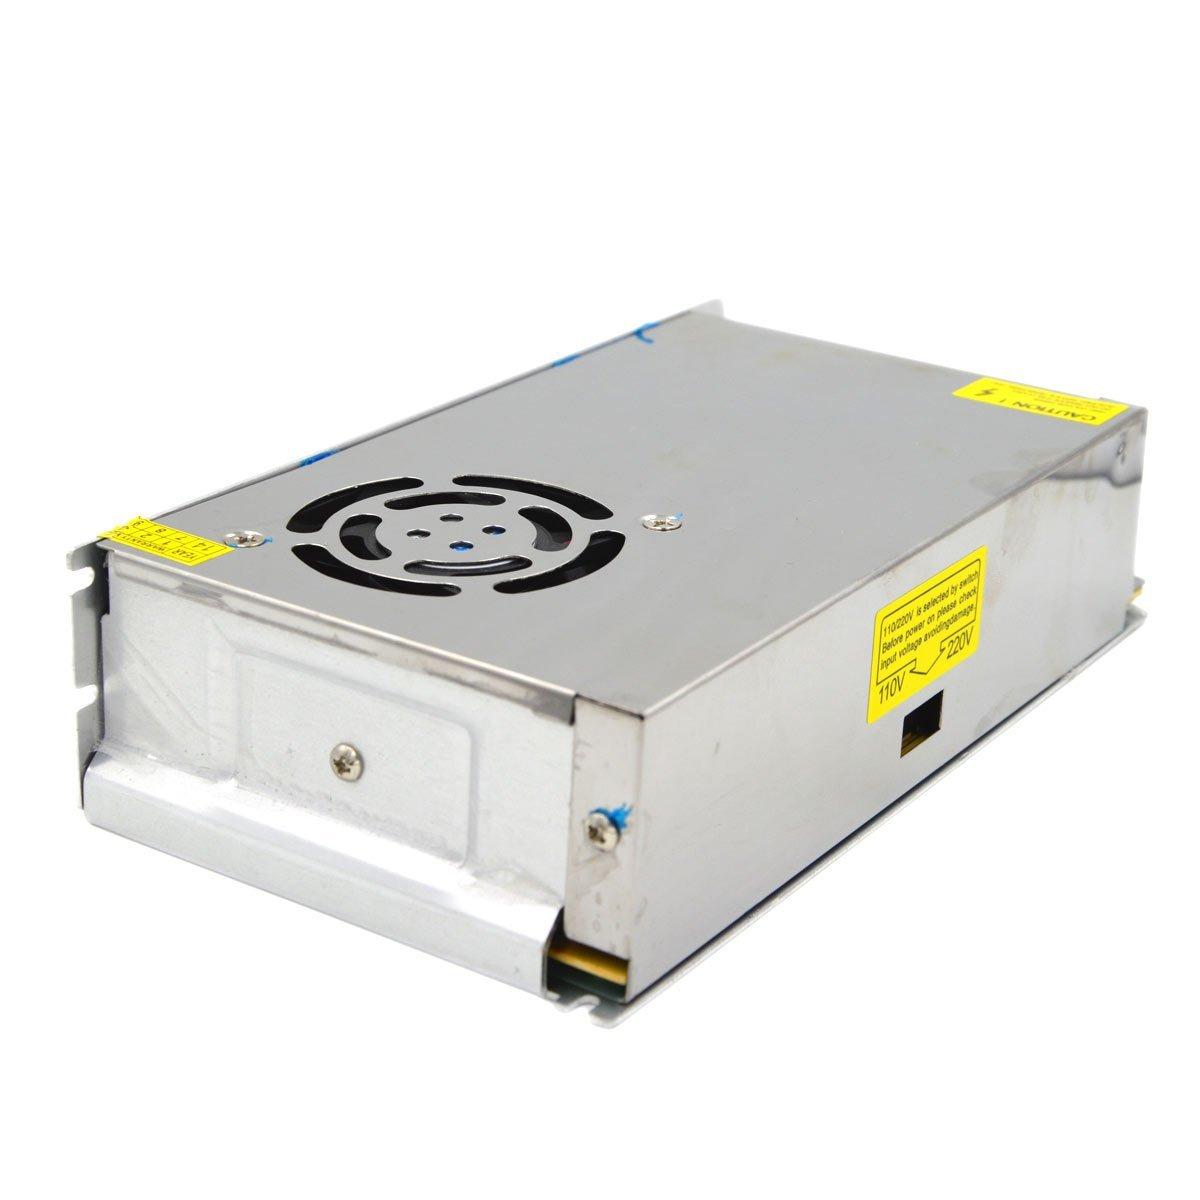 12/V alimentaci/ón de 220/V estabilizada Fuente de alimentaci/ón 30/A con ventilador transformador Switching 30/A